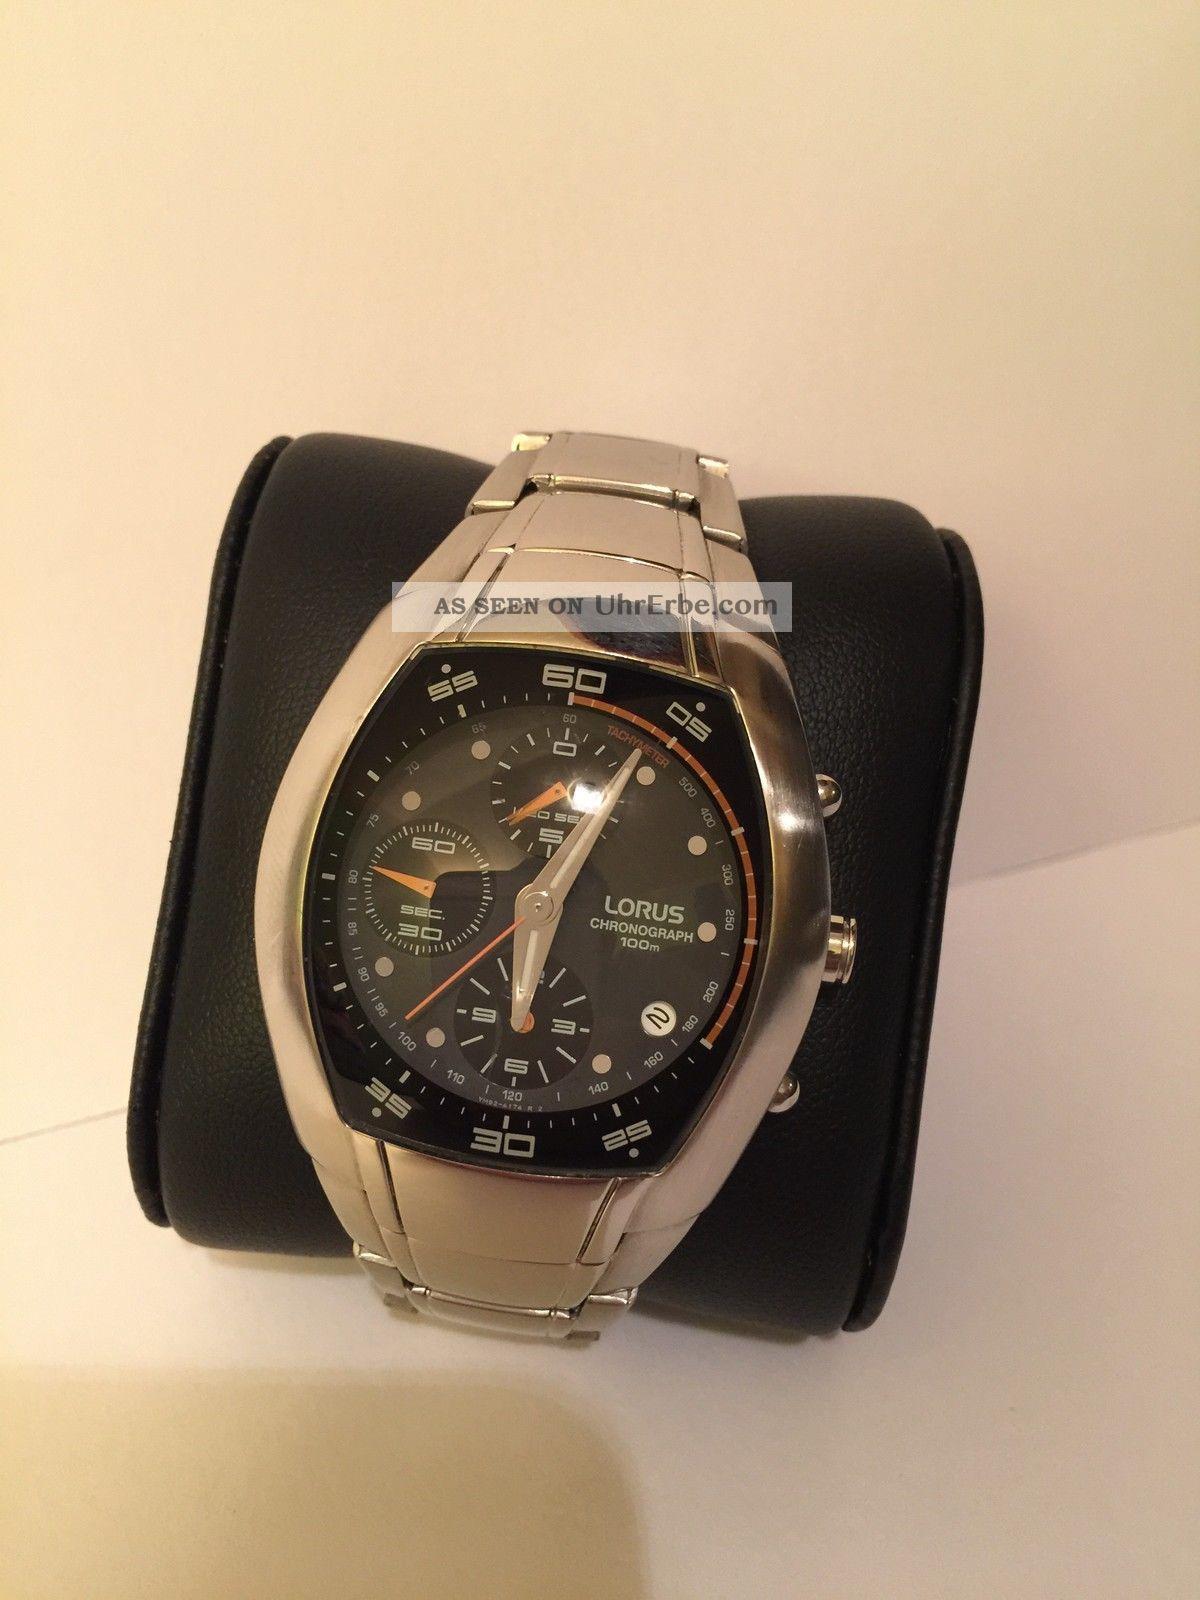 Lorus Chronograph Rf8 - Serie / Kaliber Ym92 Armbanduhren Bild